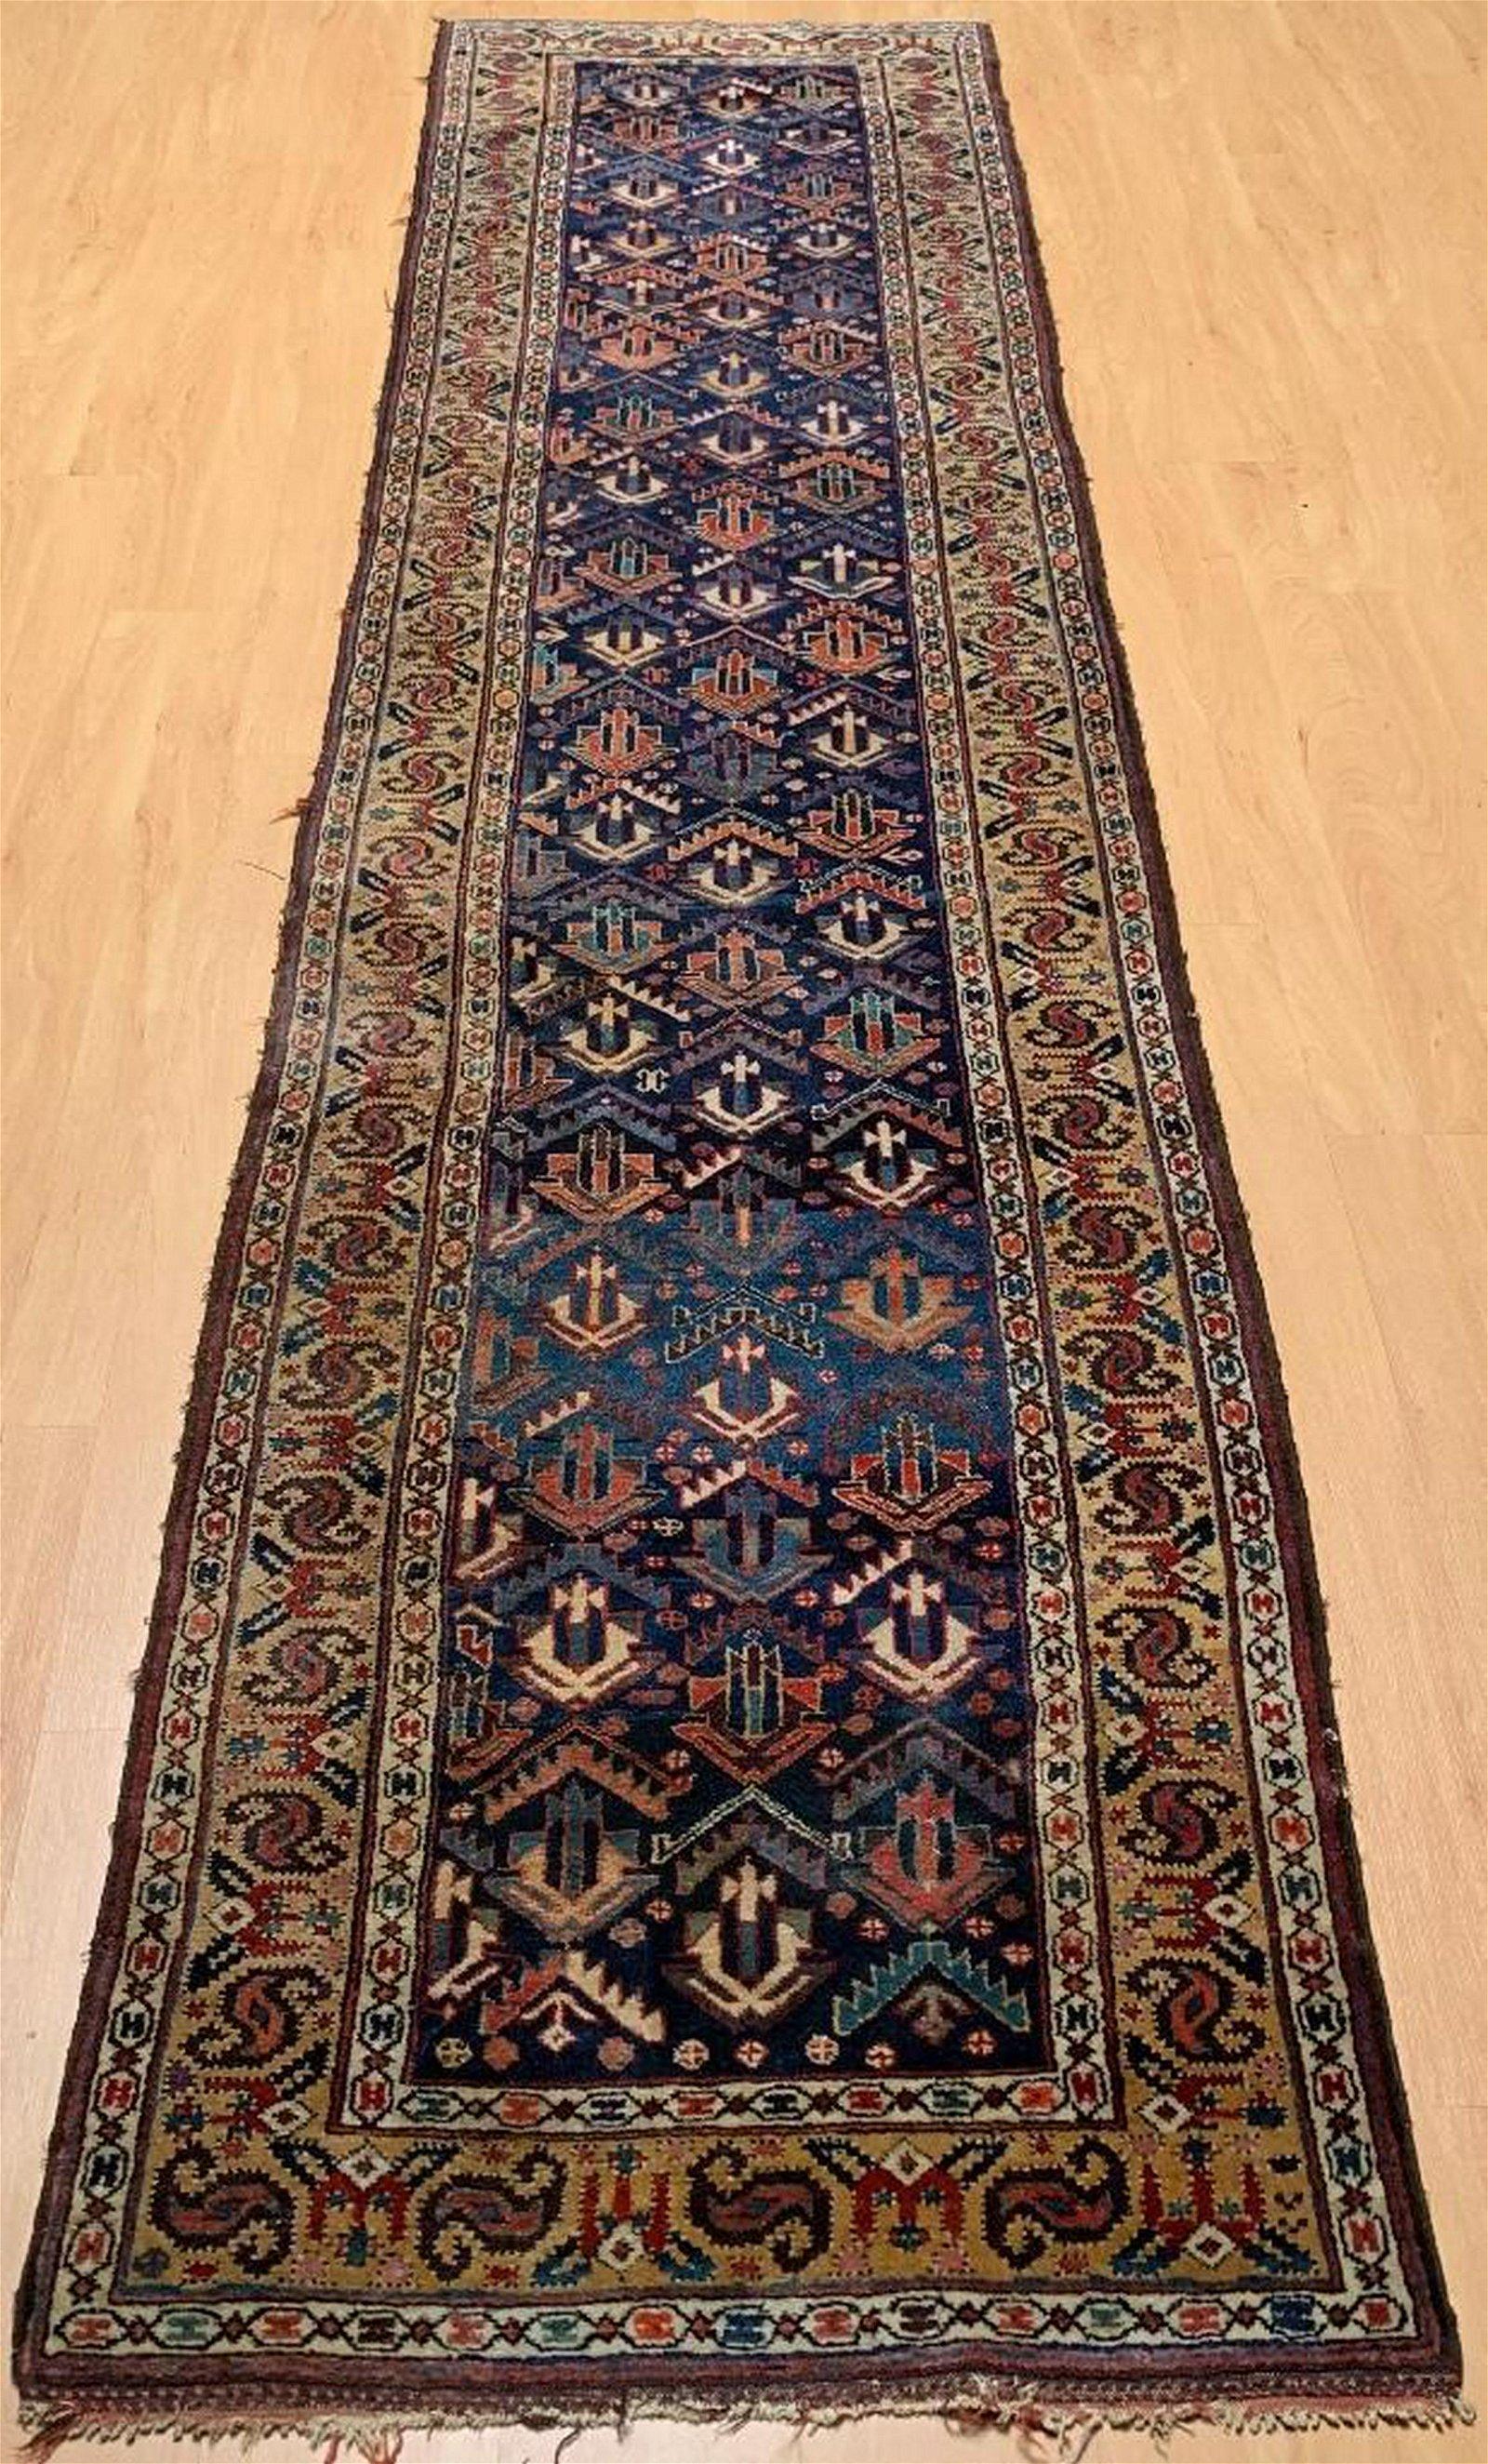 Caucasian Shirvan Wool Carpet Runner, Antique